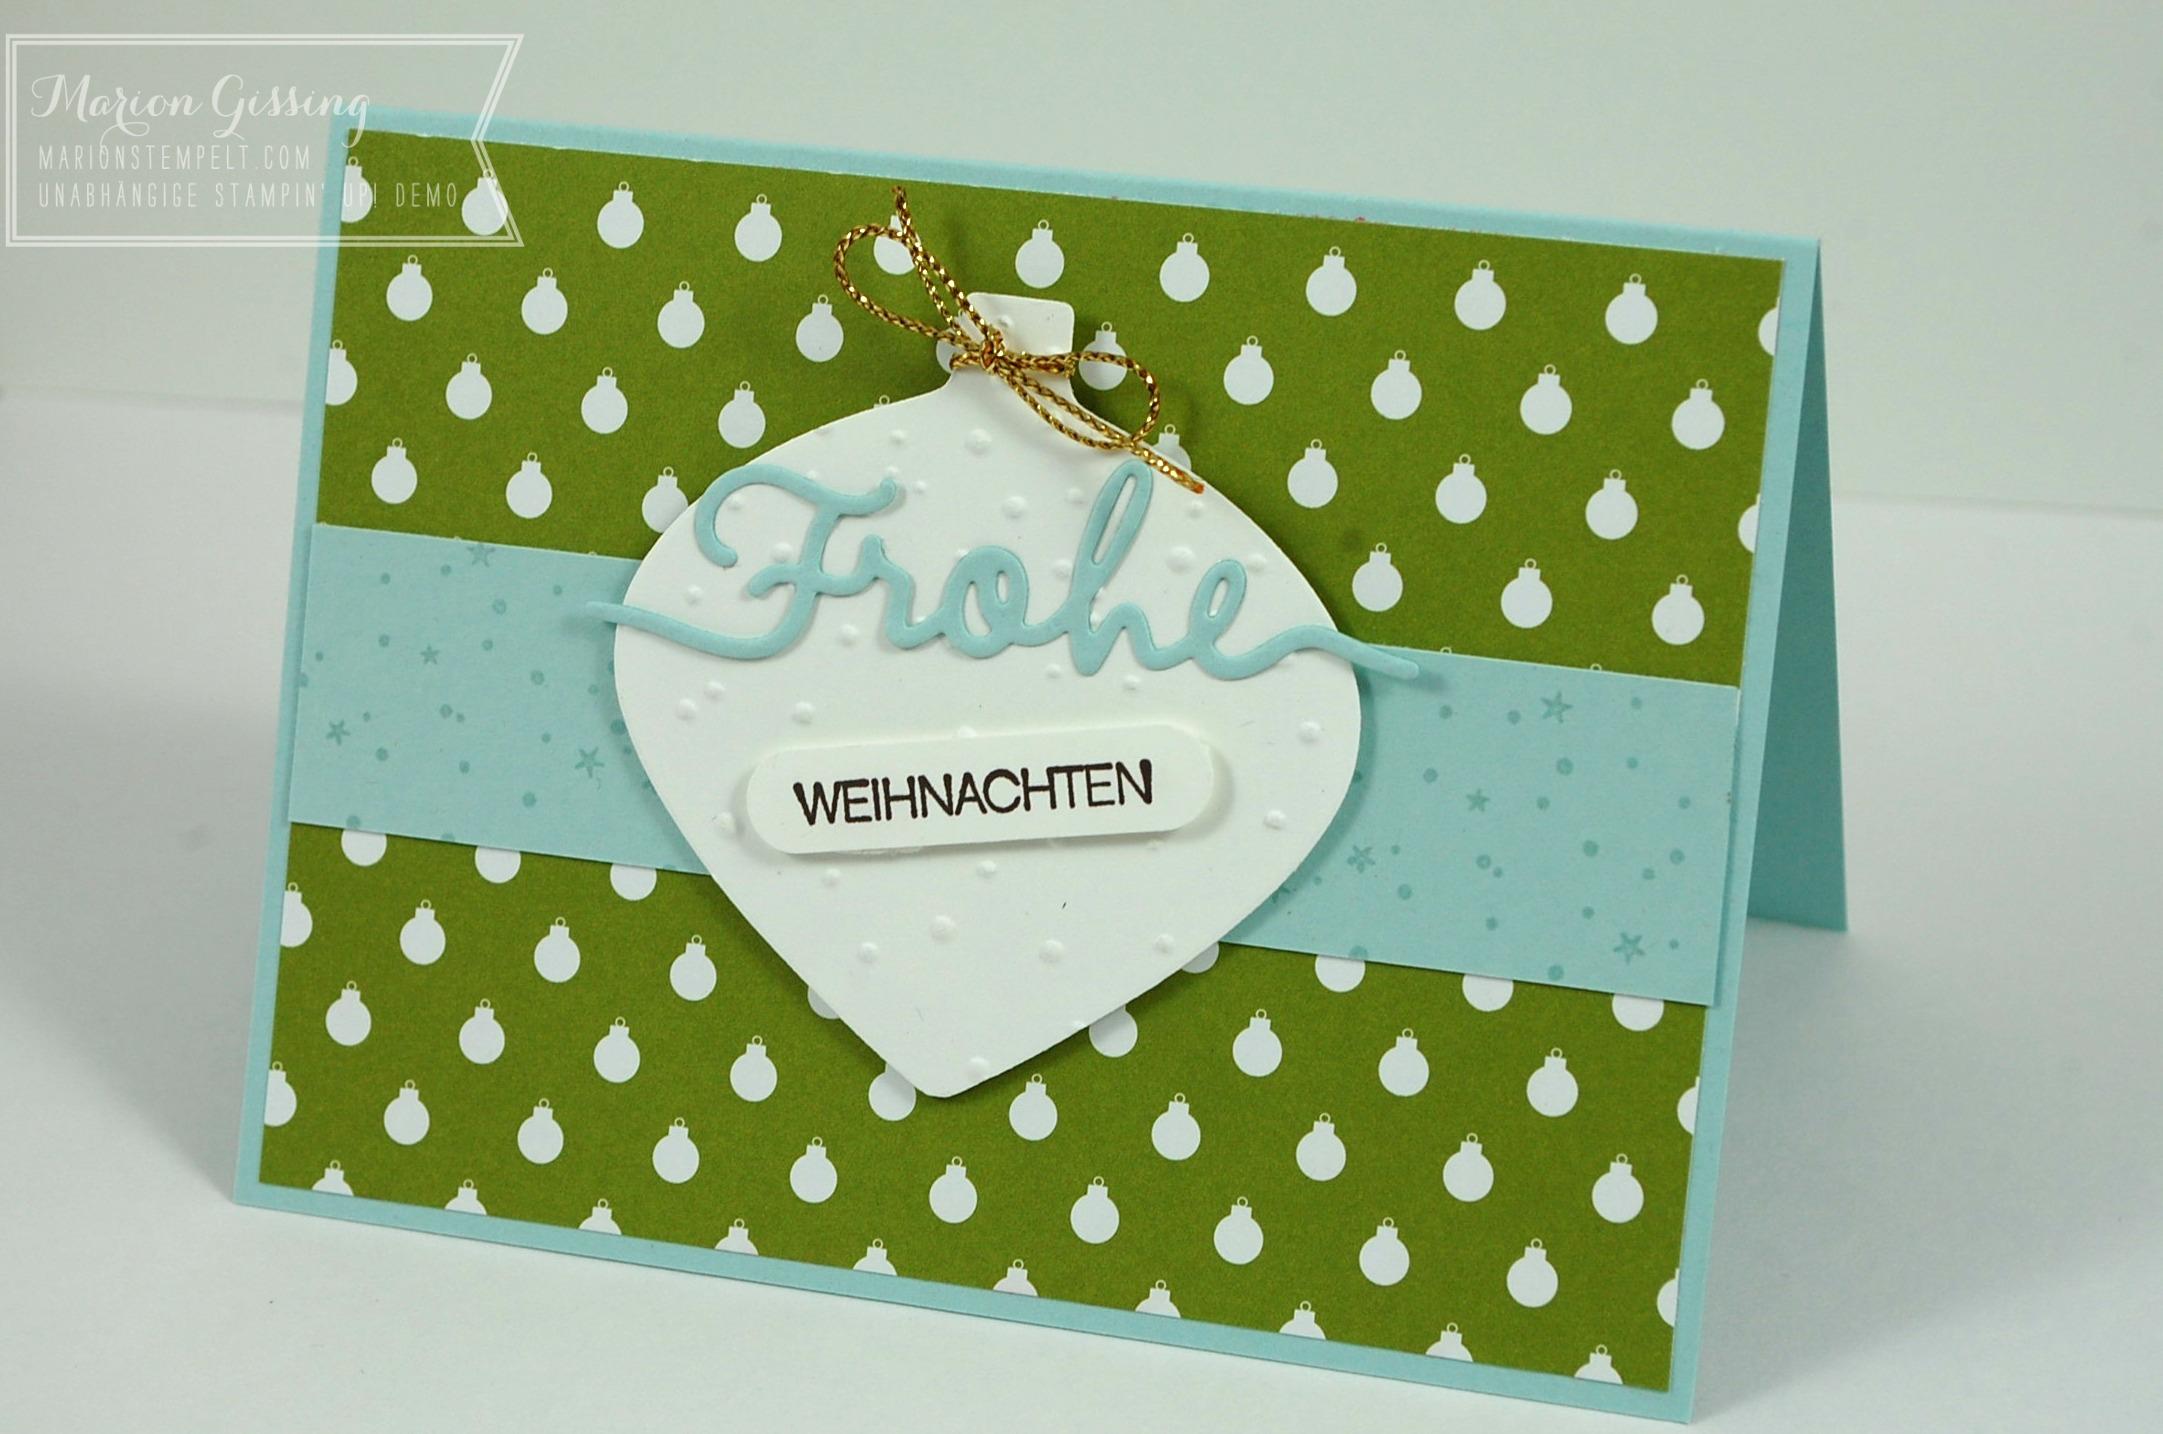 Christbaumkugeln Brombeer.Stampin Up In Munchen Marionstempelt Stampin Up Workshops